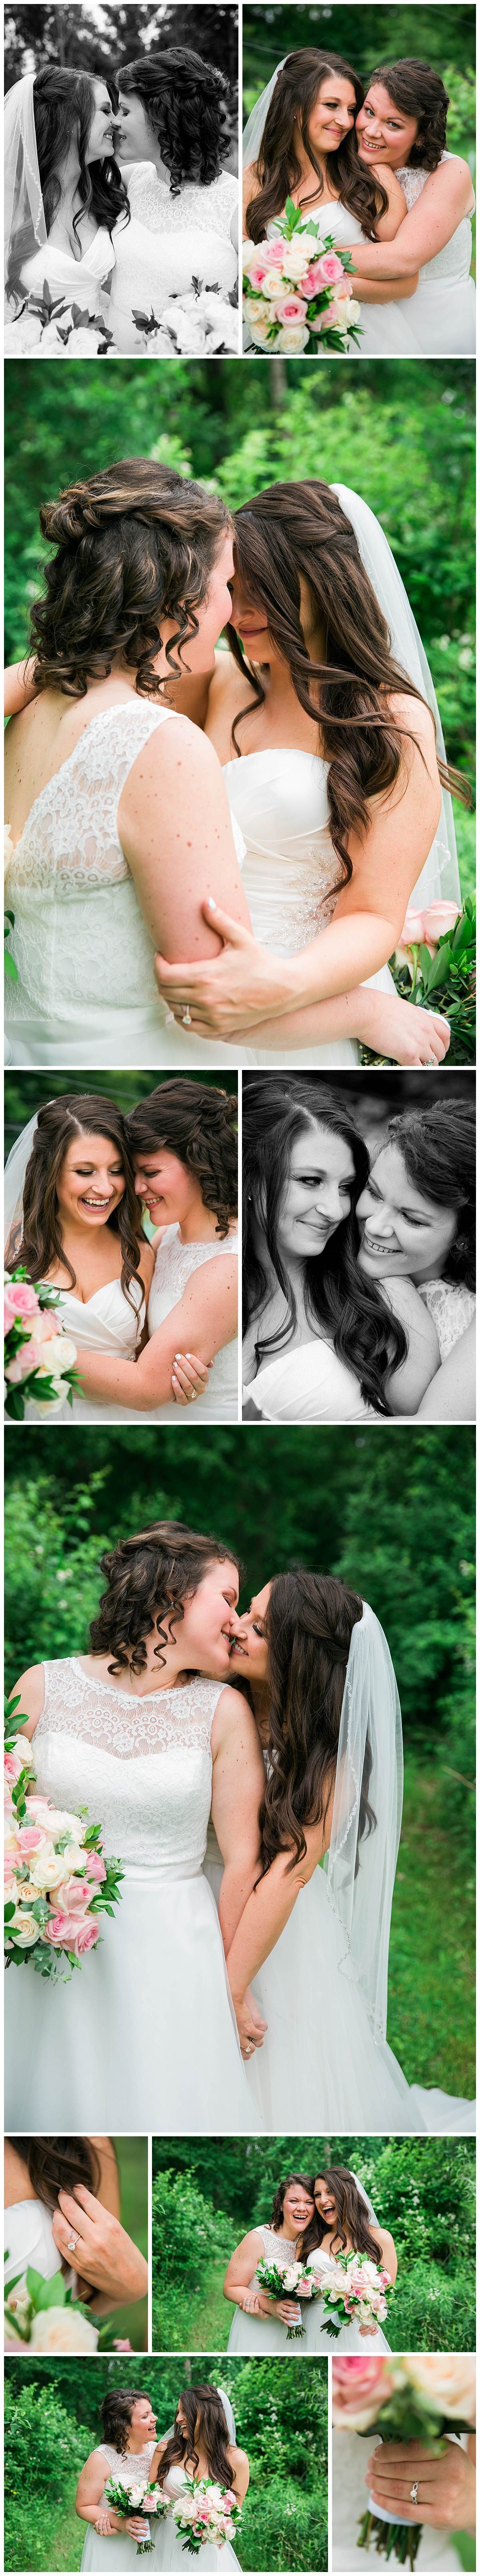 Cleveland-Wedding-Photographer_0038.jpg